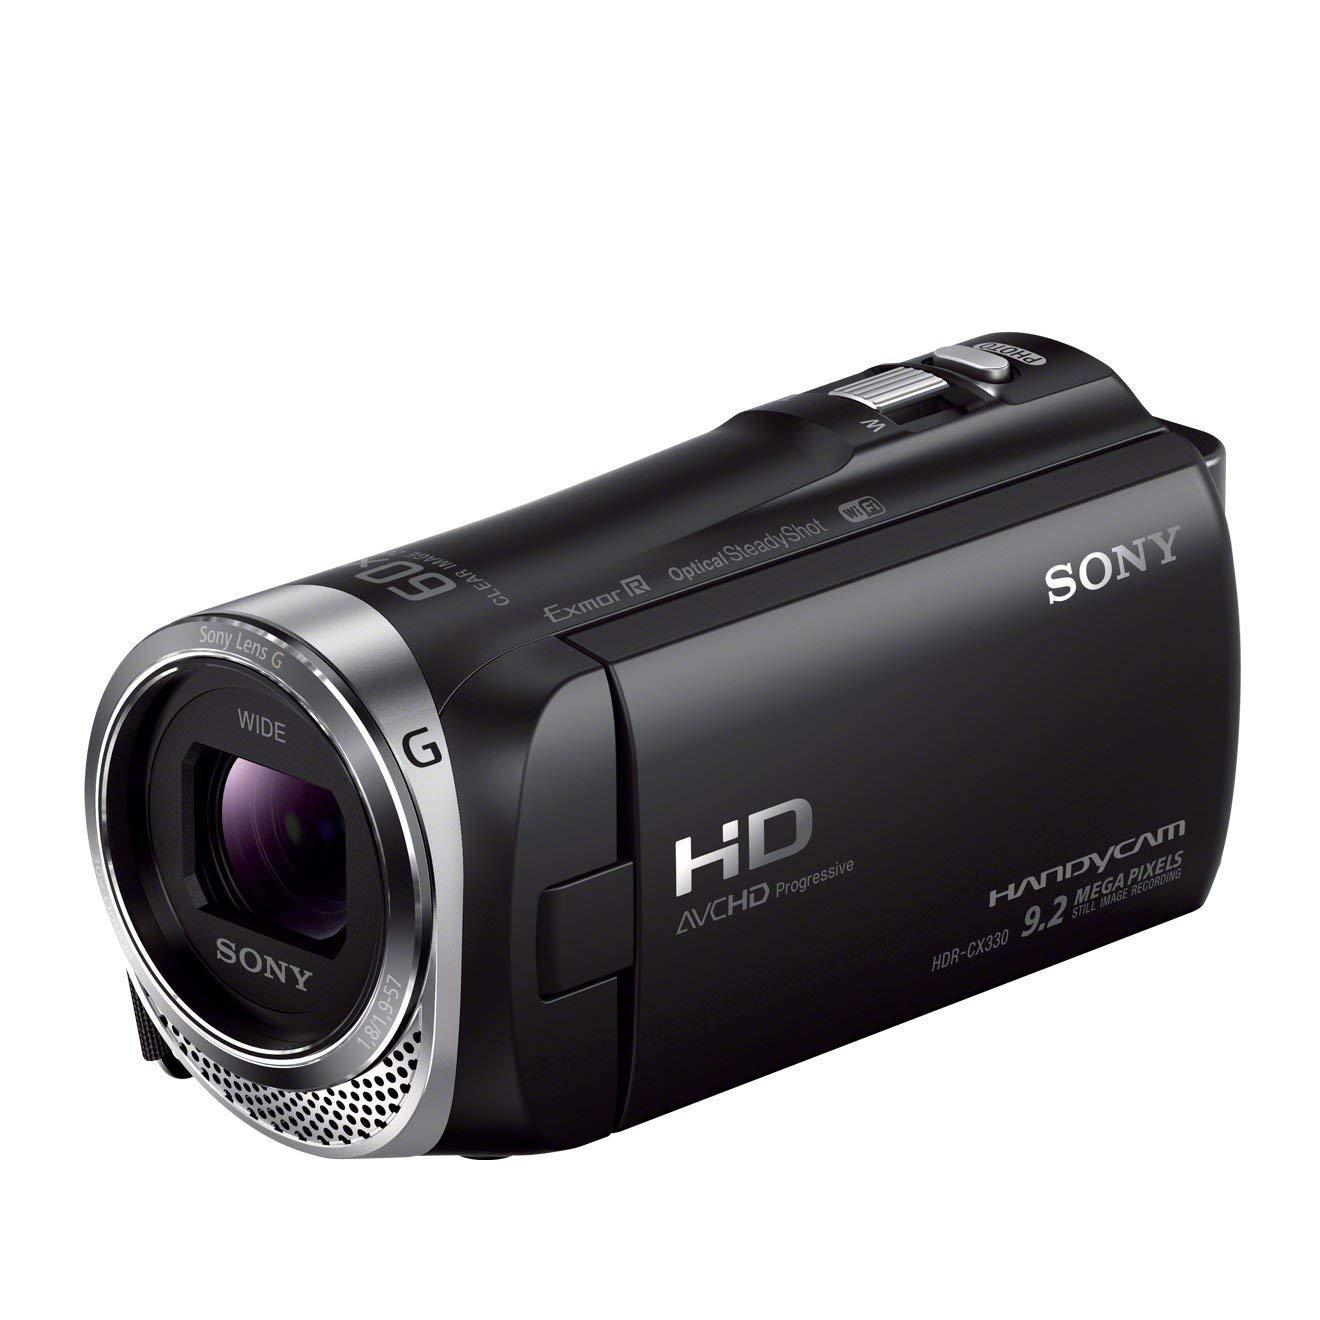 "Sony Handycam HDR-CX330E - Videocámara Full HD 1080p (2.3 Mp, pantalla de 2.7"", zoom óptico 30x, estabilizador, WiFi), negro"